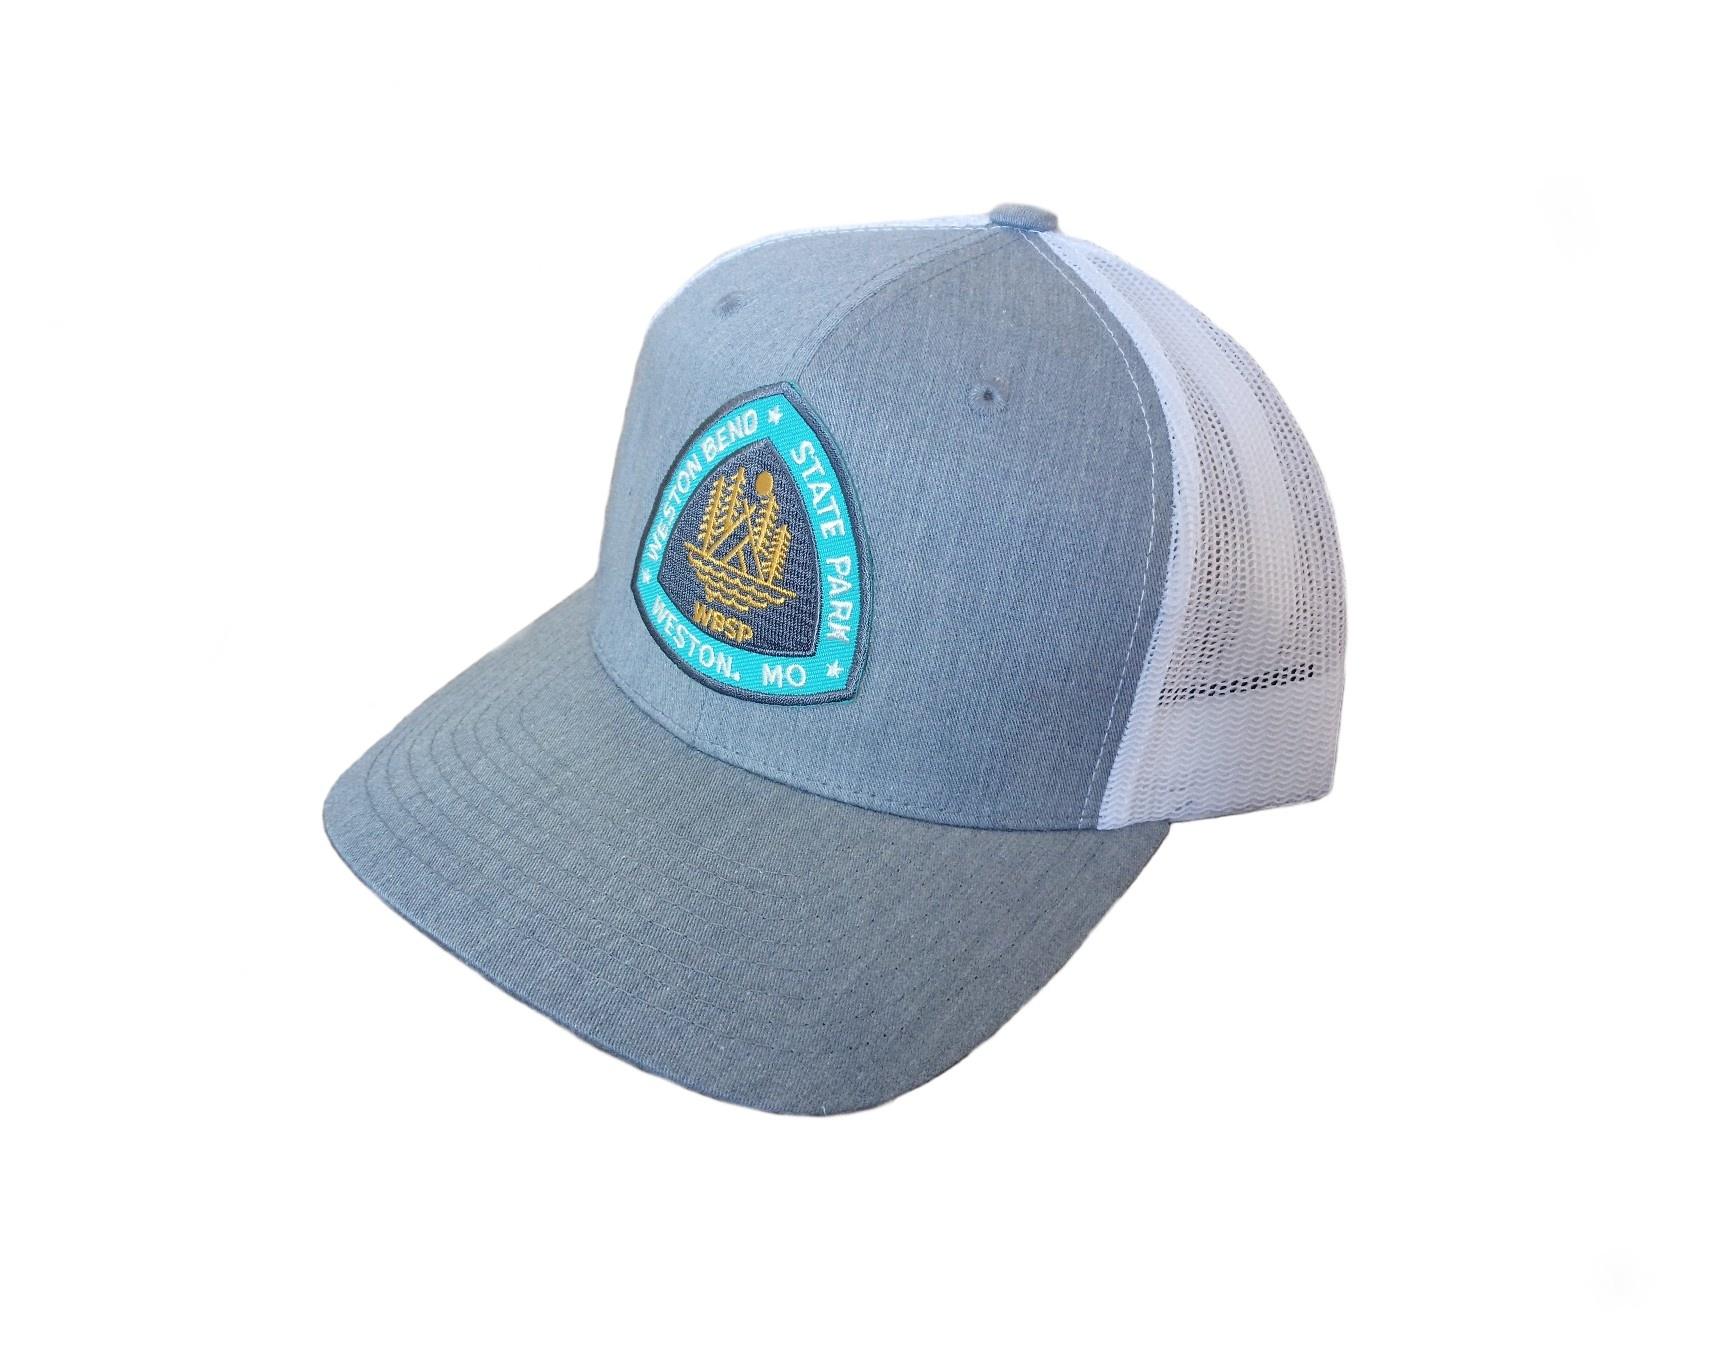 Weston Bend State Park Gray & White Hat